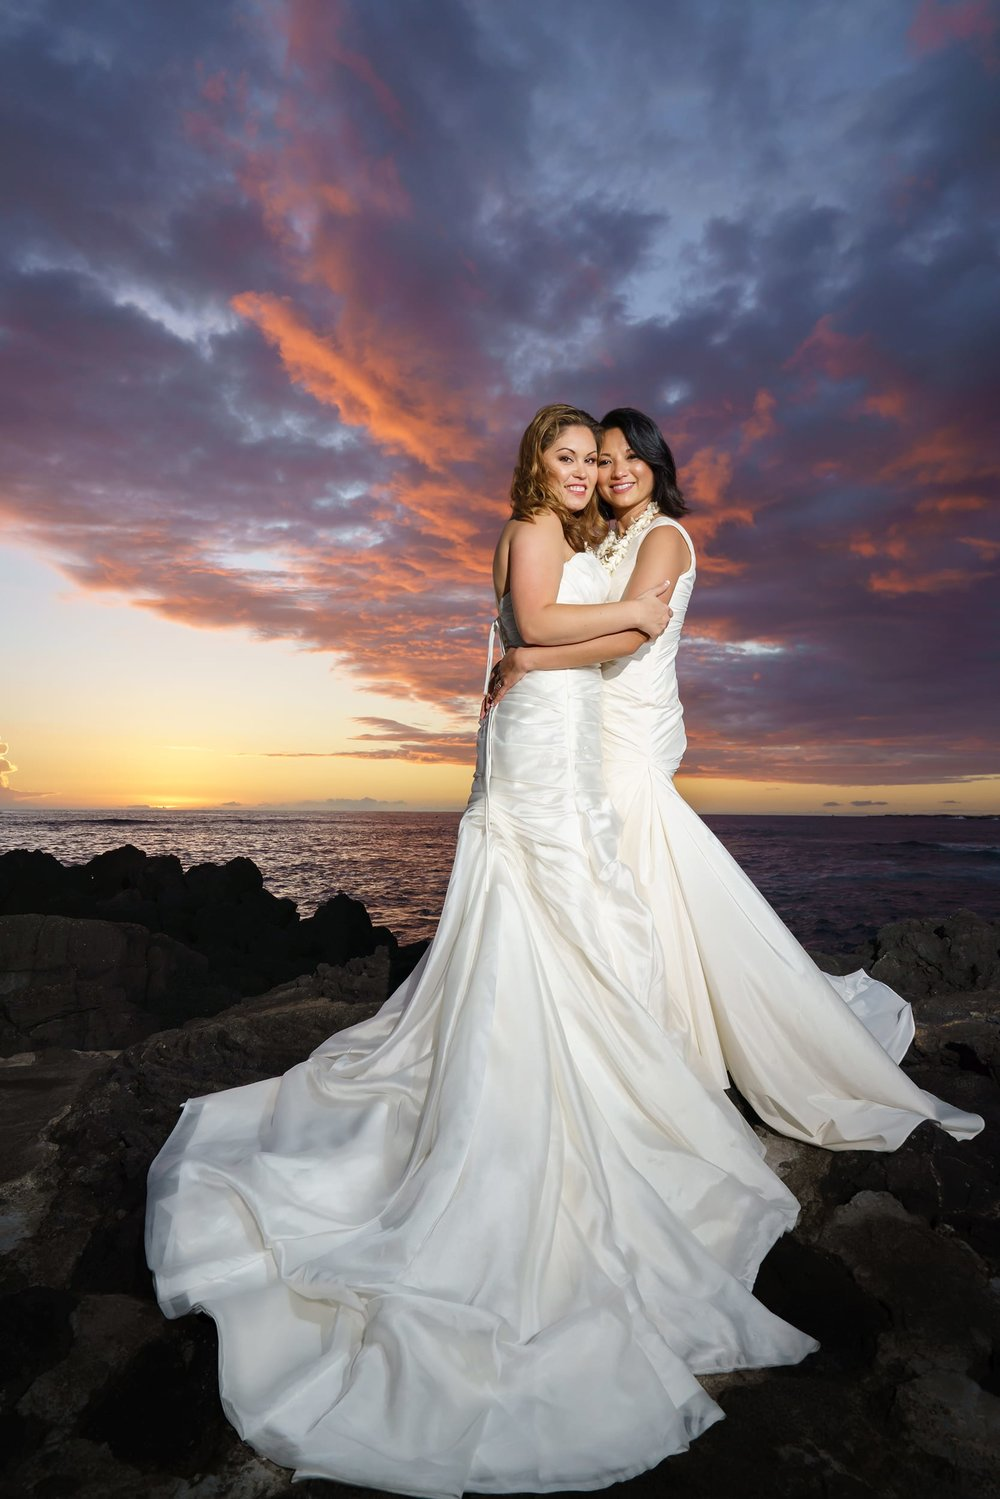 Big-Island-Wedding-Brides-LGBT-Hawaii-Photographer-Nohea-Point-18-1.jpg